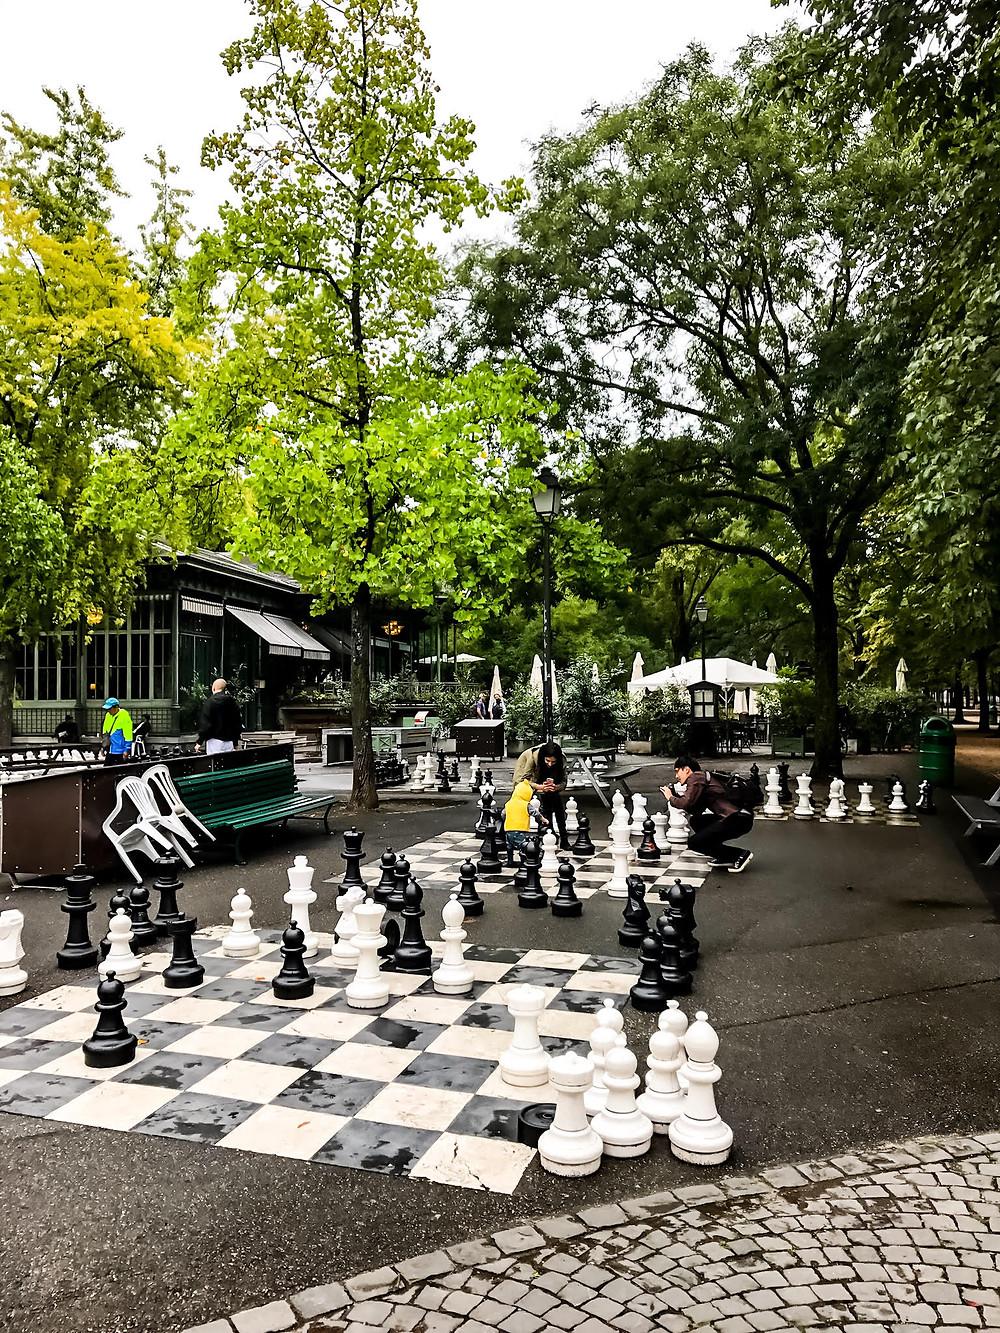 Chess in le Parc des Bastions